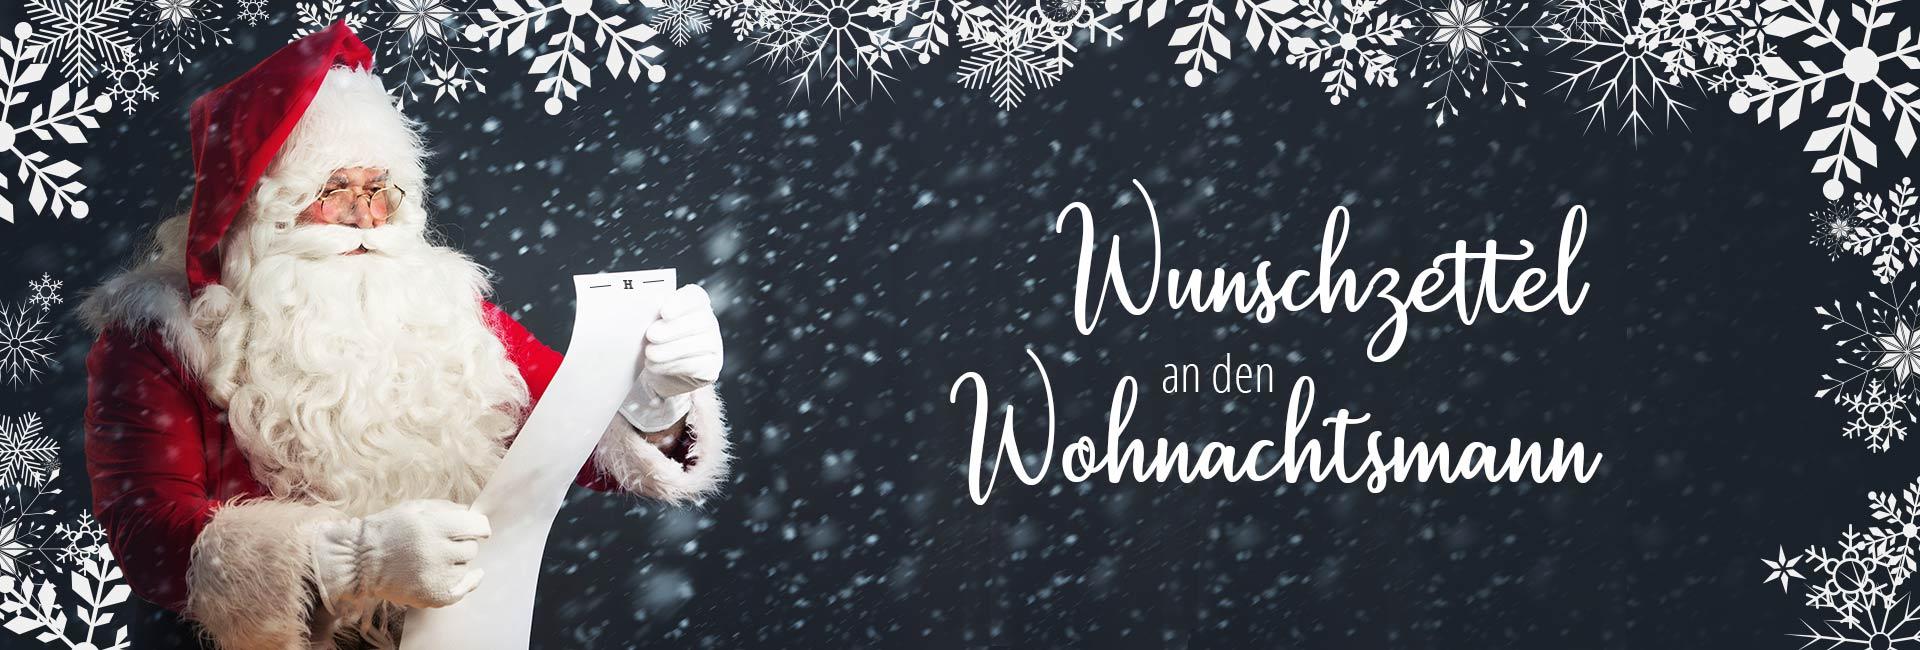 Wunschzettel an den Wohnachtsmann 1